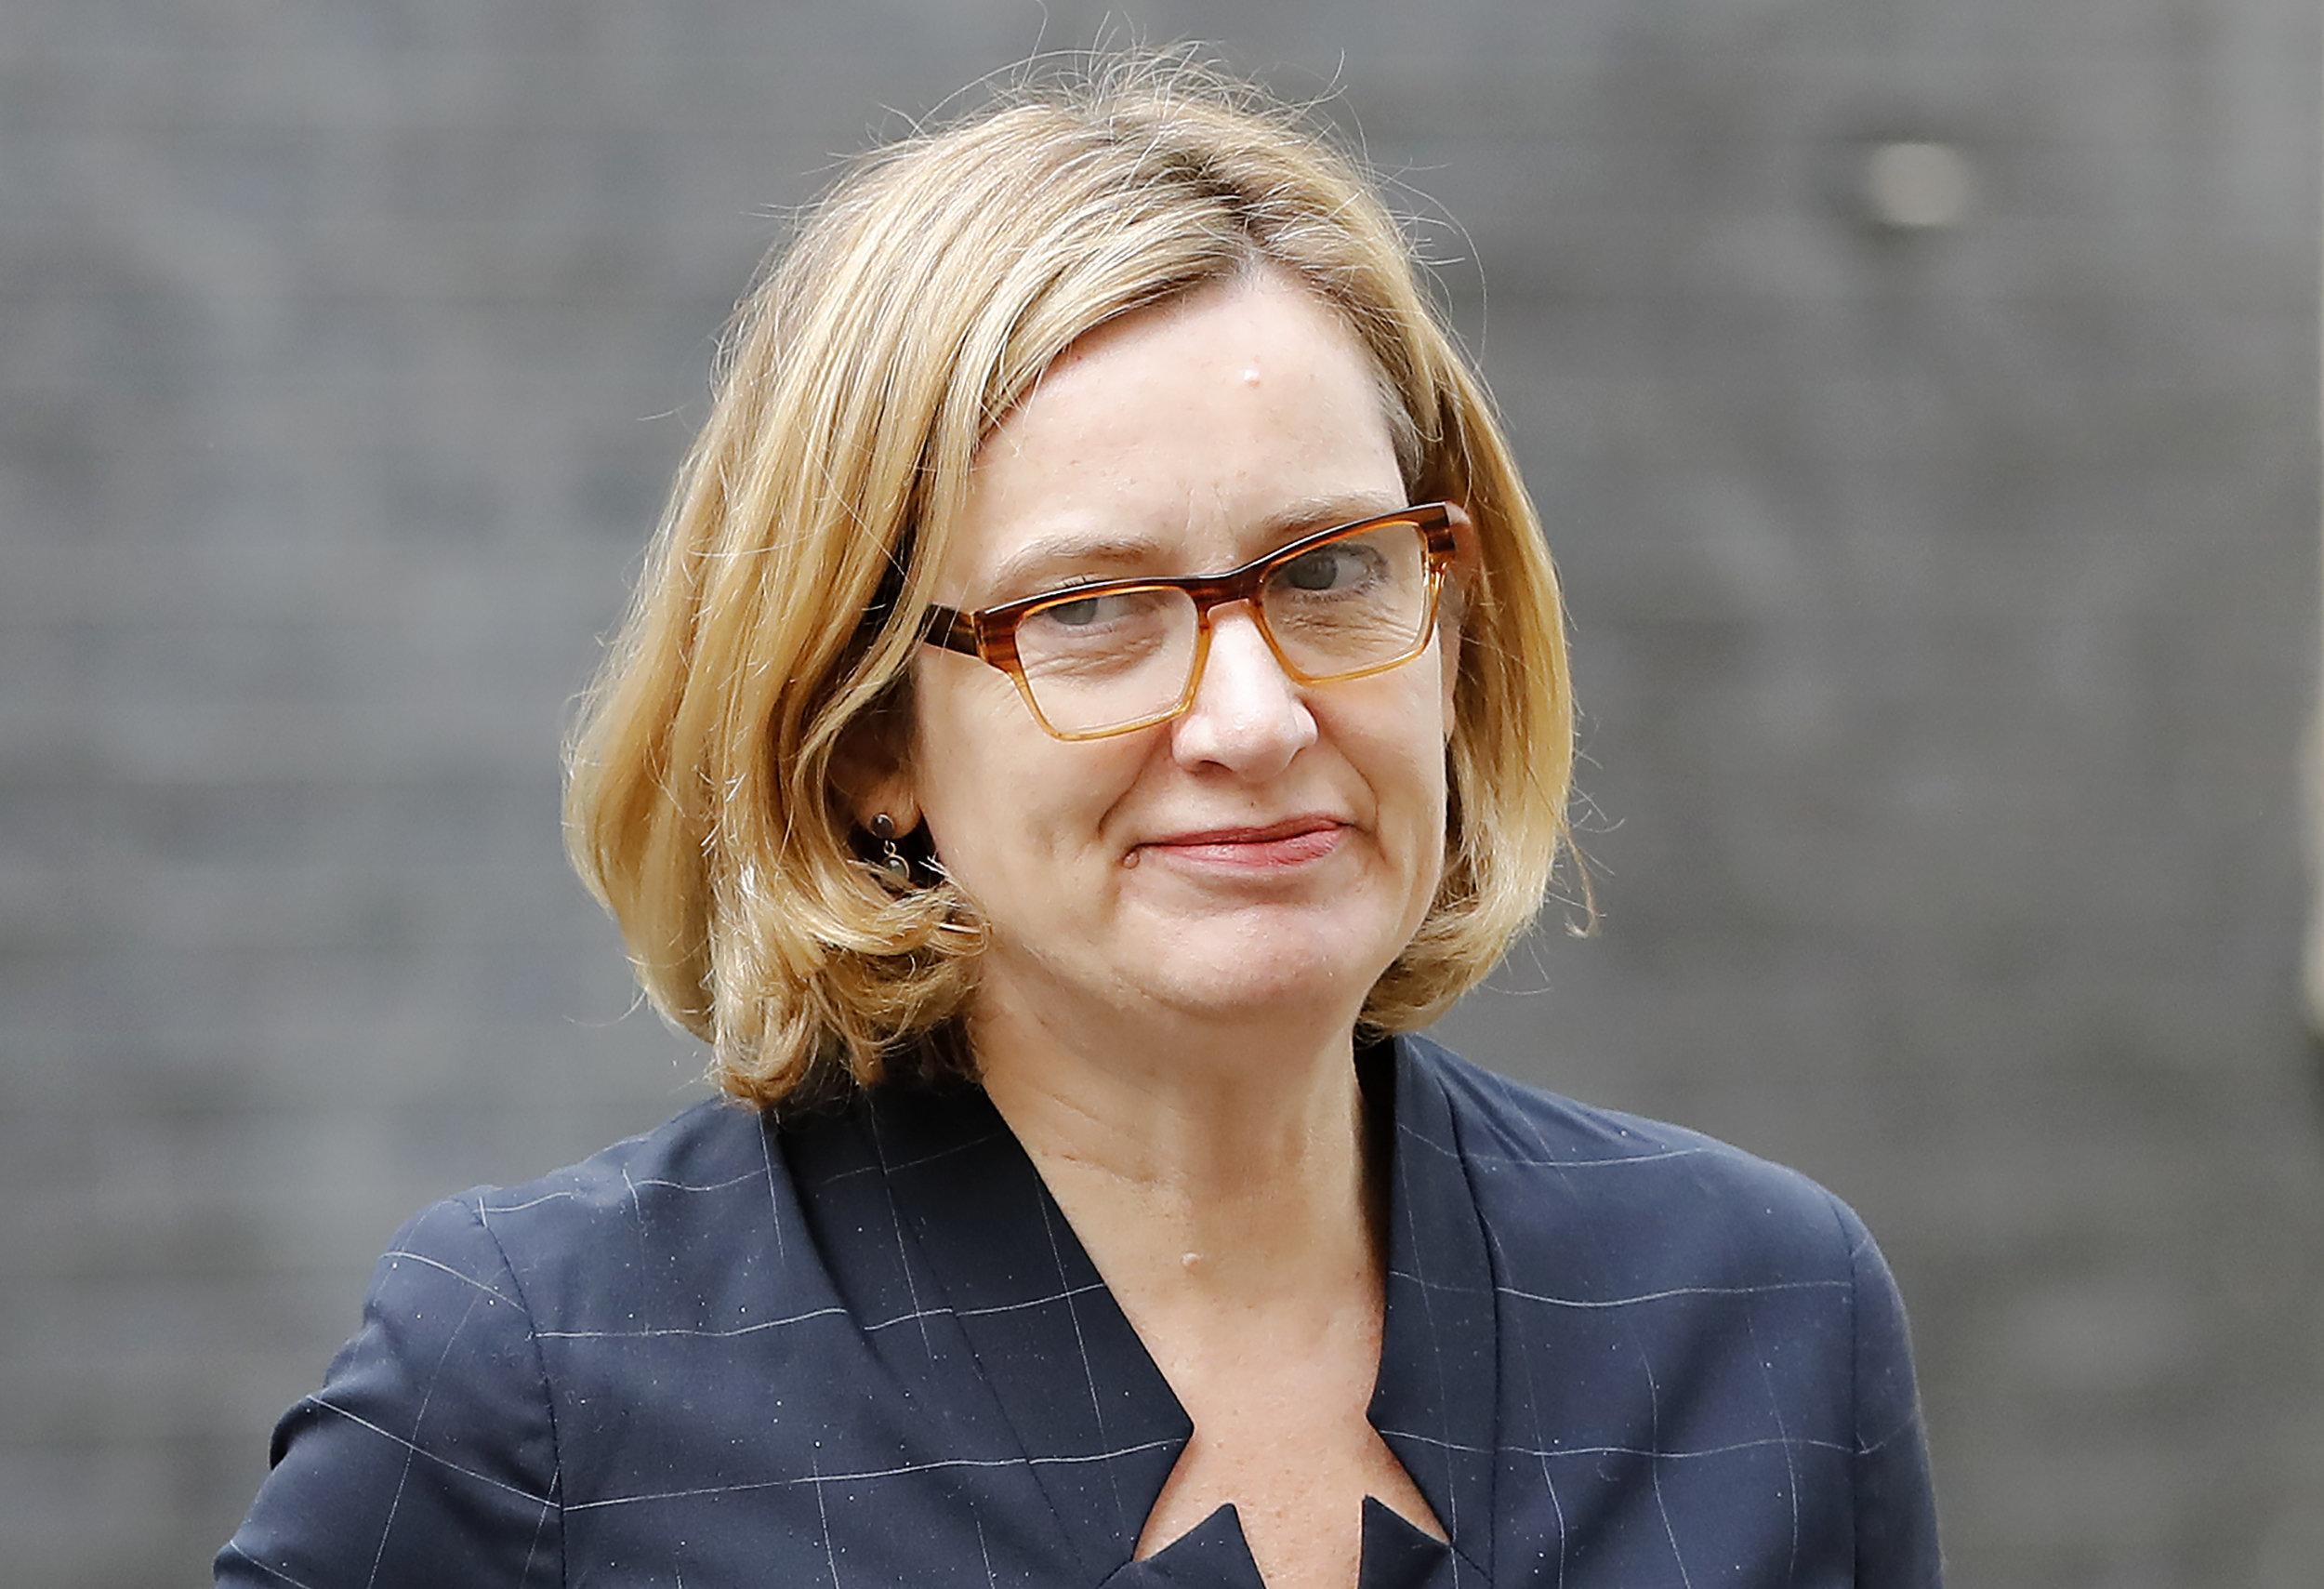 Windrush Hotline Has Left Callers Feeling 'Afraid And Upset', MP